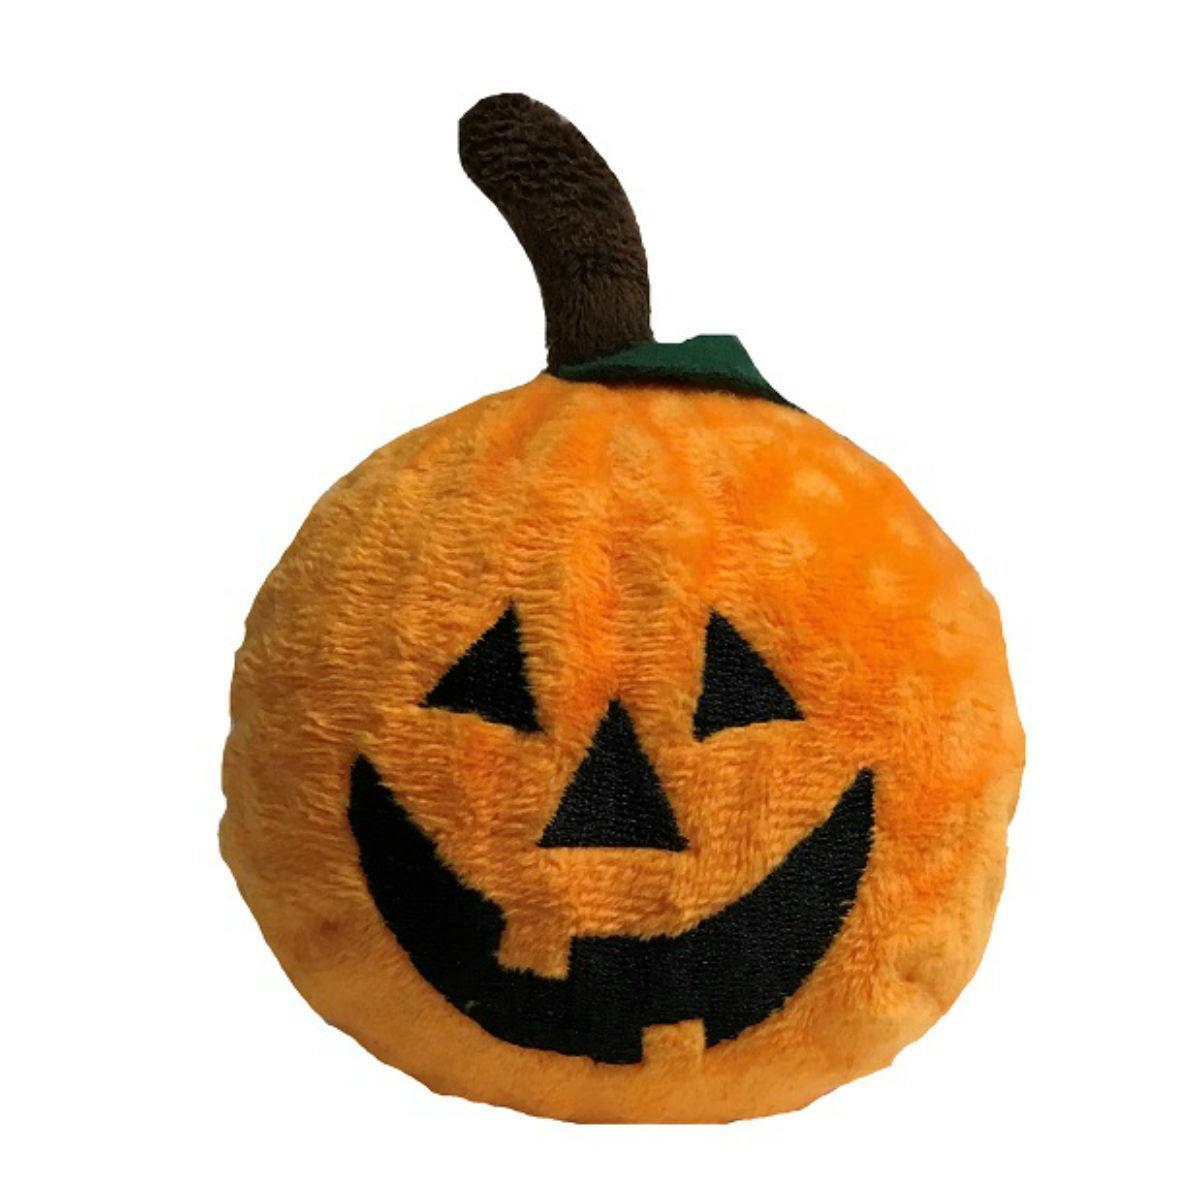 fabdog® Halloween faball® Dog Toy - Pumpkin